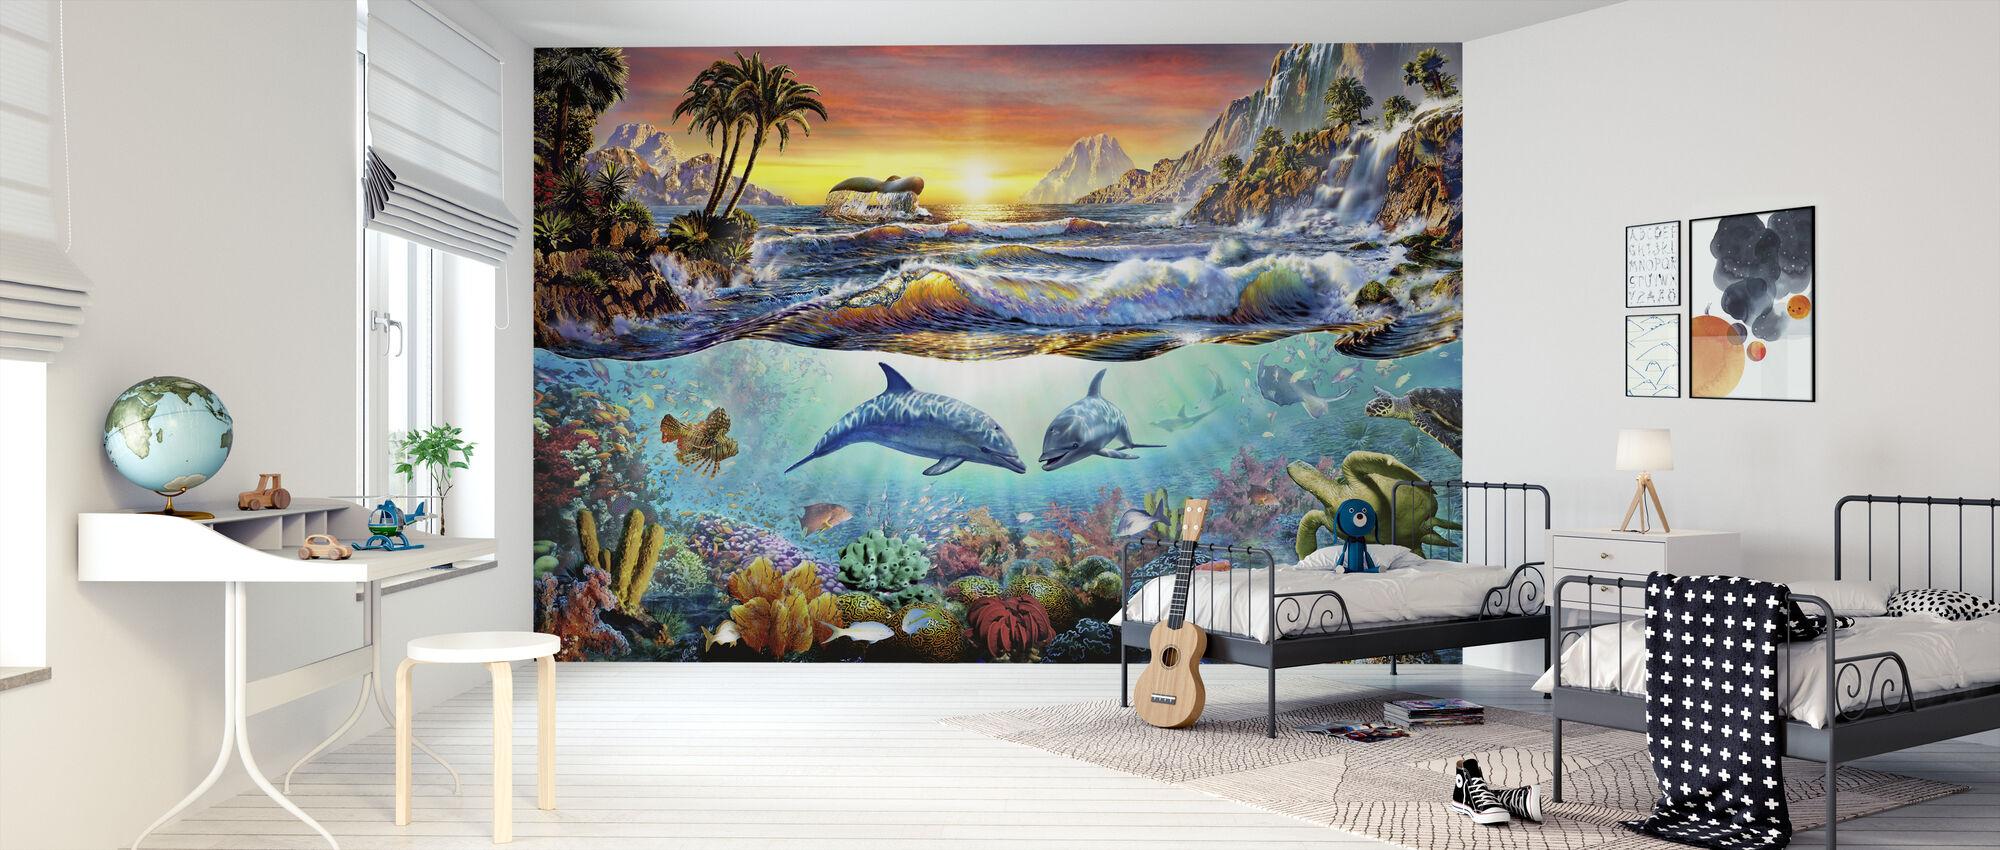 Paradise bay - Wallpaper - Kids Room